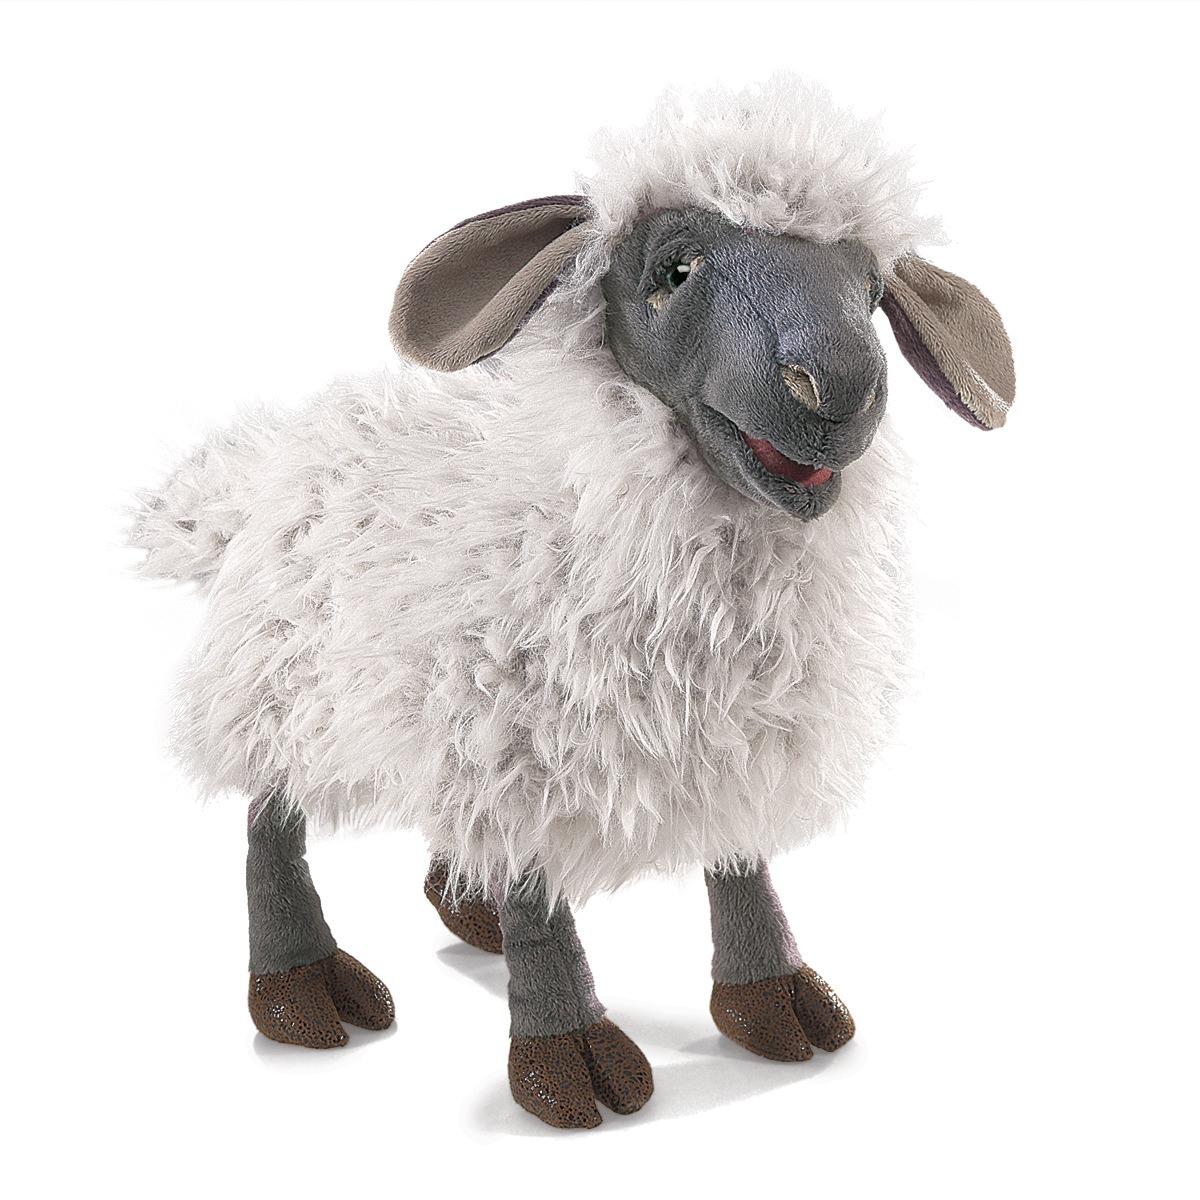 Ovce Wensleydale plyšová 38 × 20 × 17,5cm Folkmanis | skladem